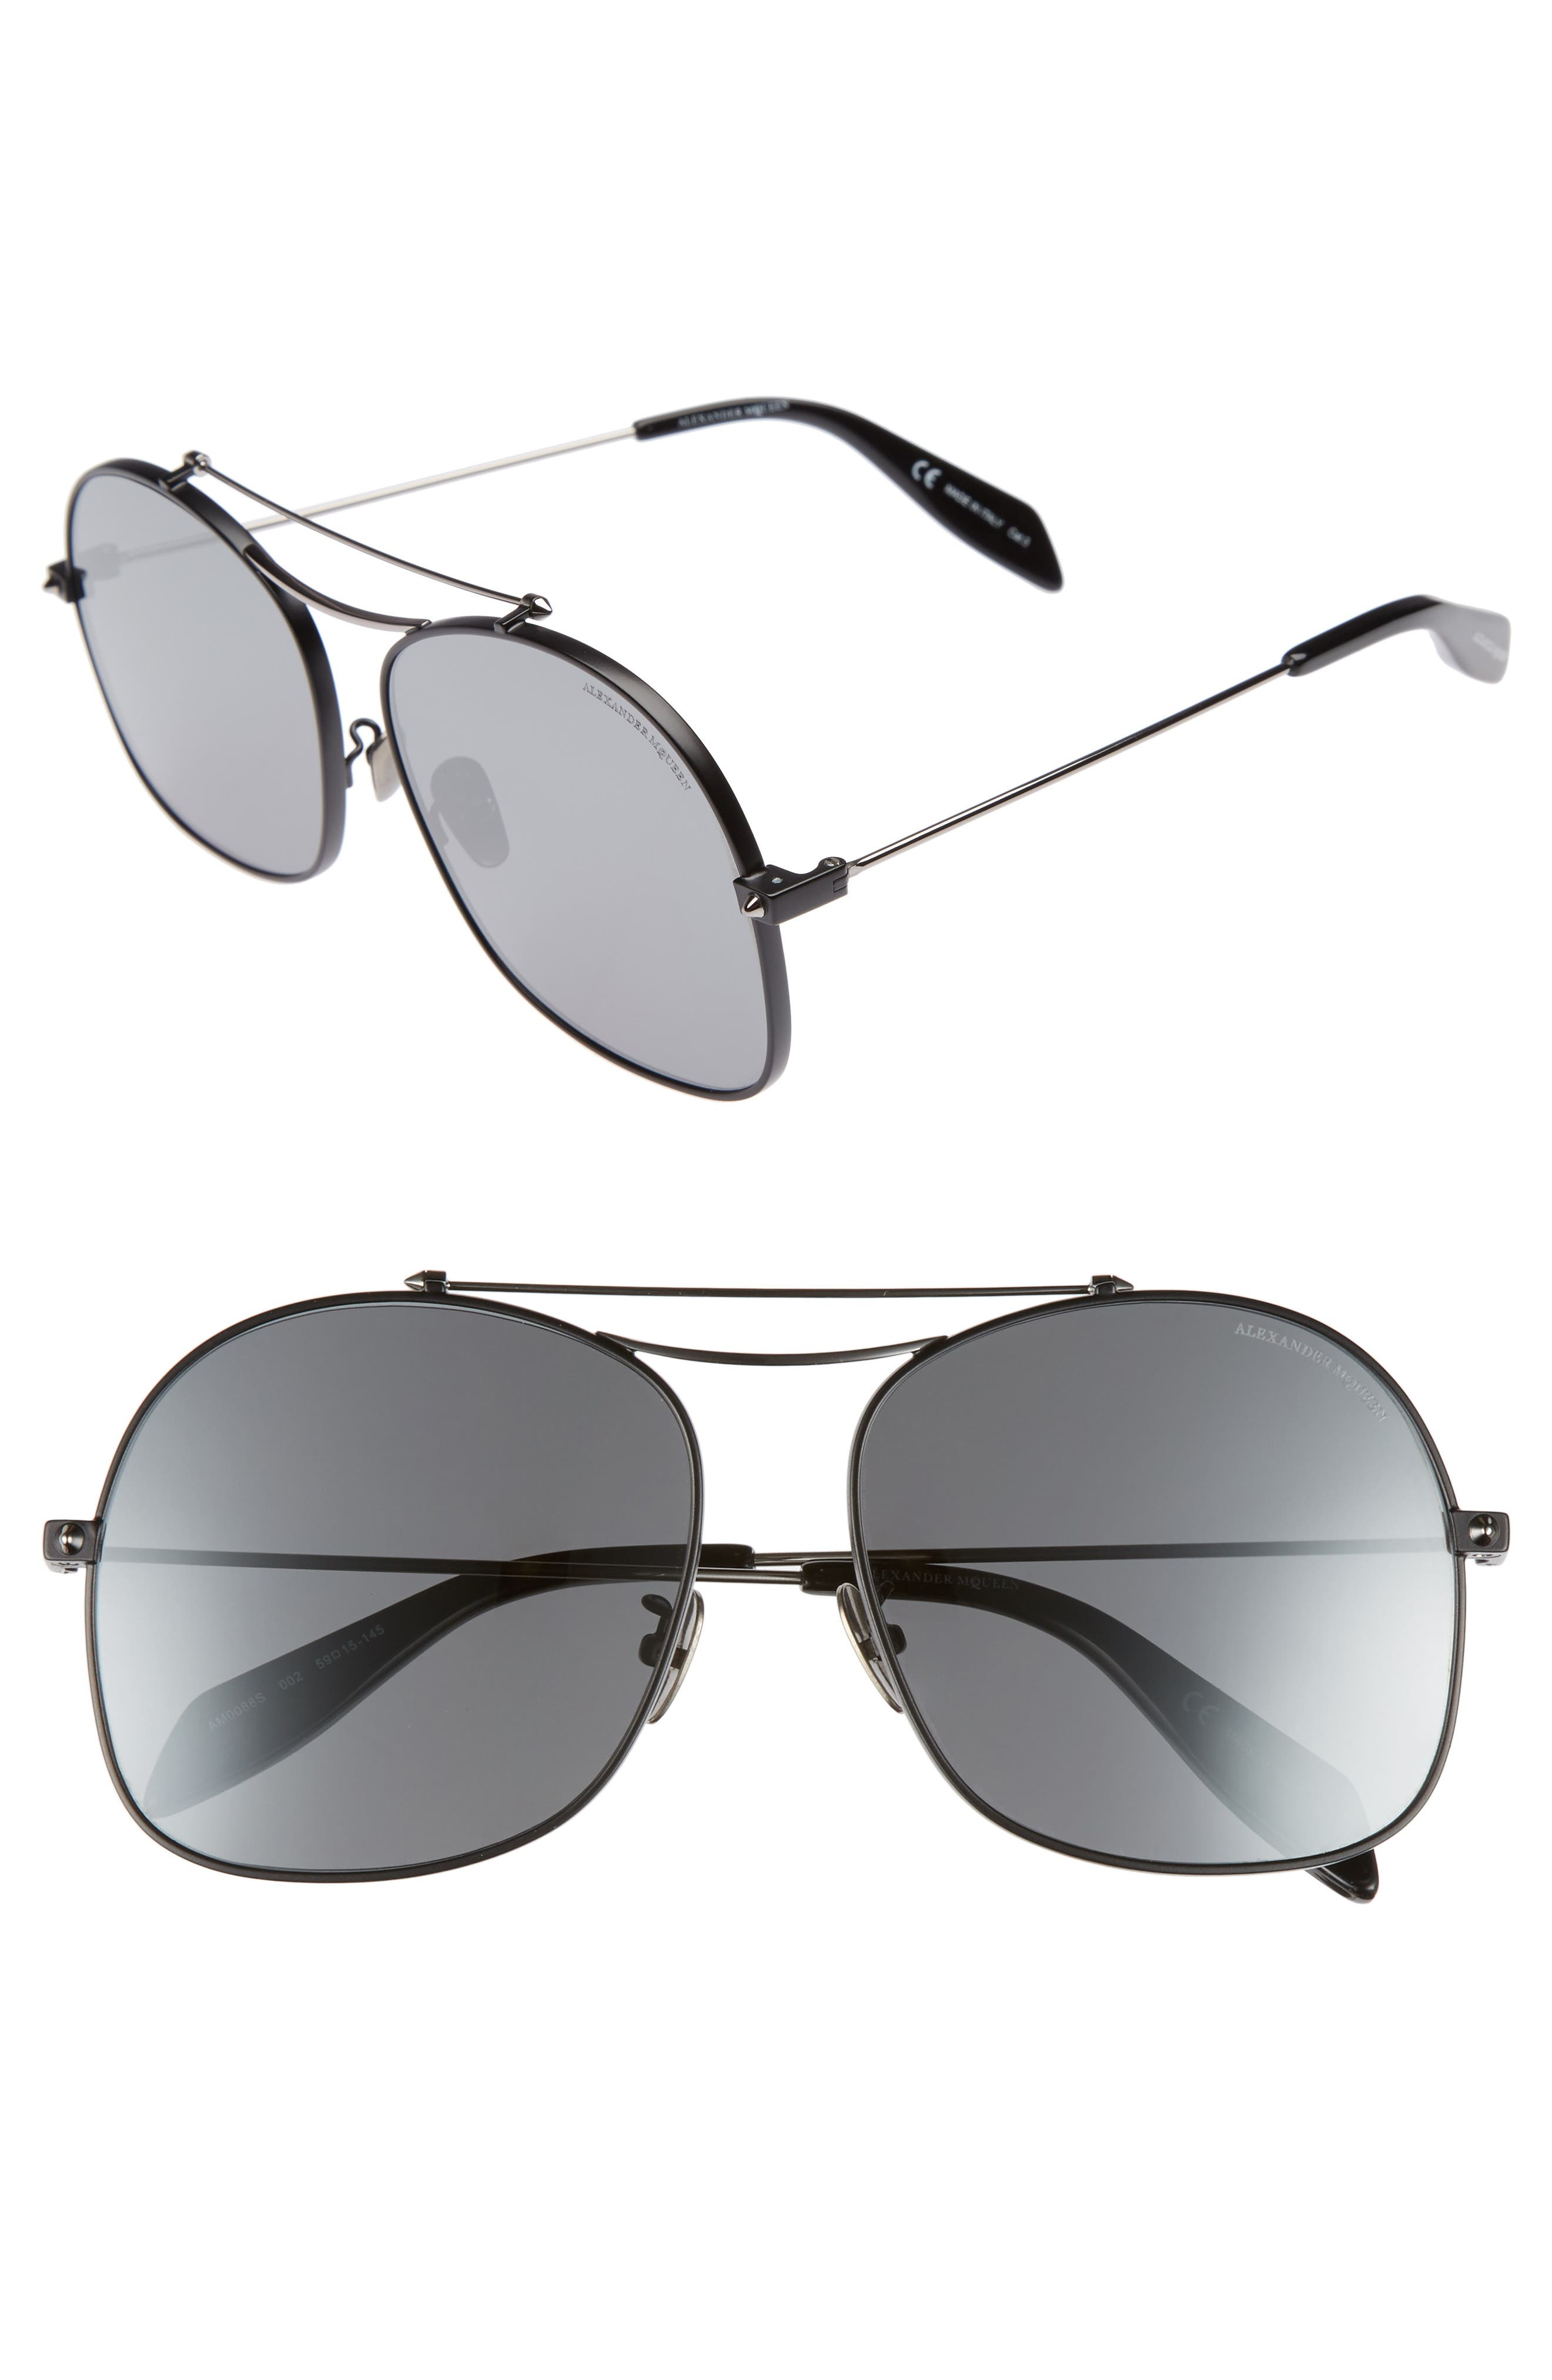 Main Image - Alexander McQueen 59mm Aviator Sunglasses